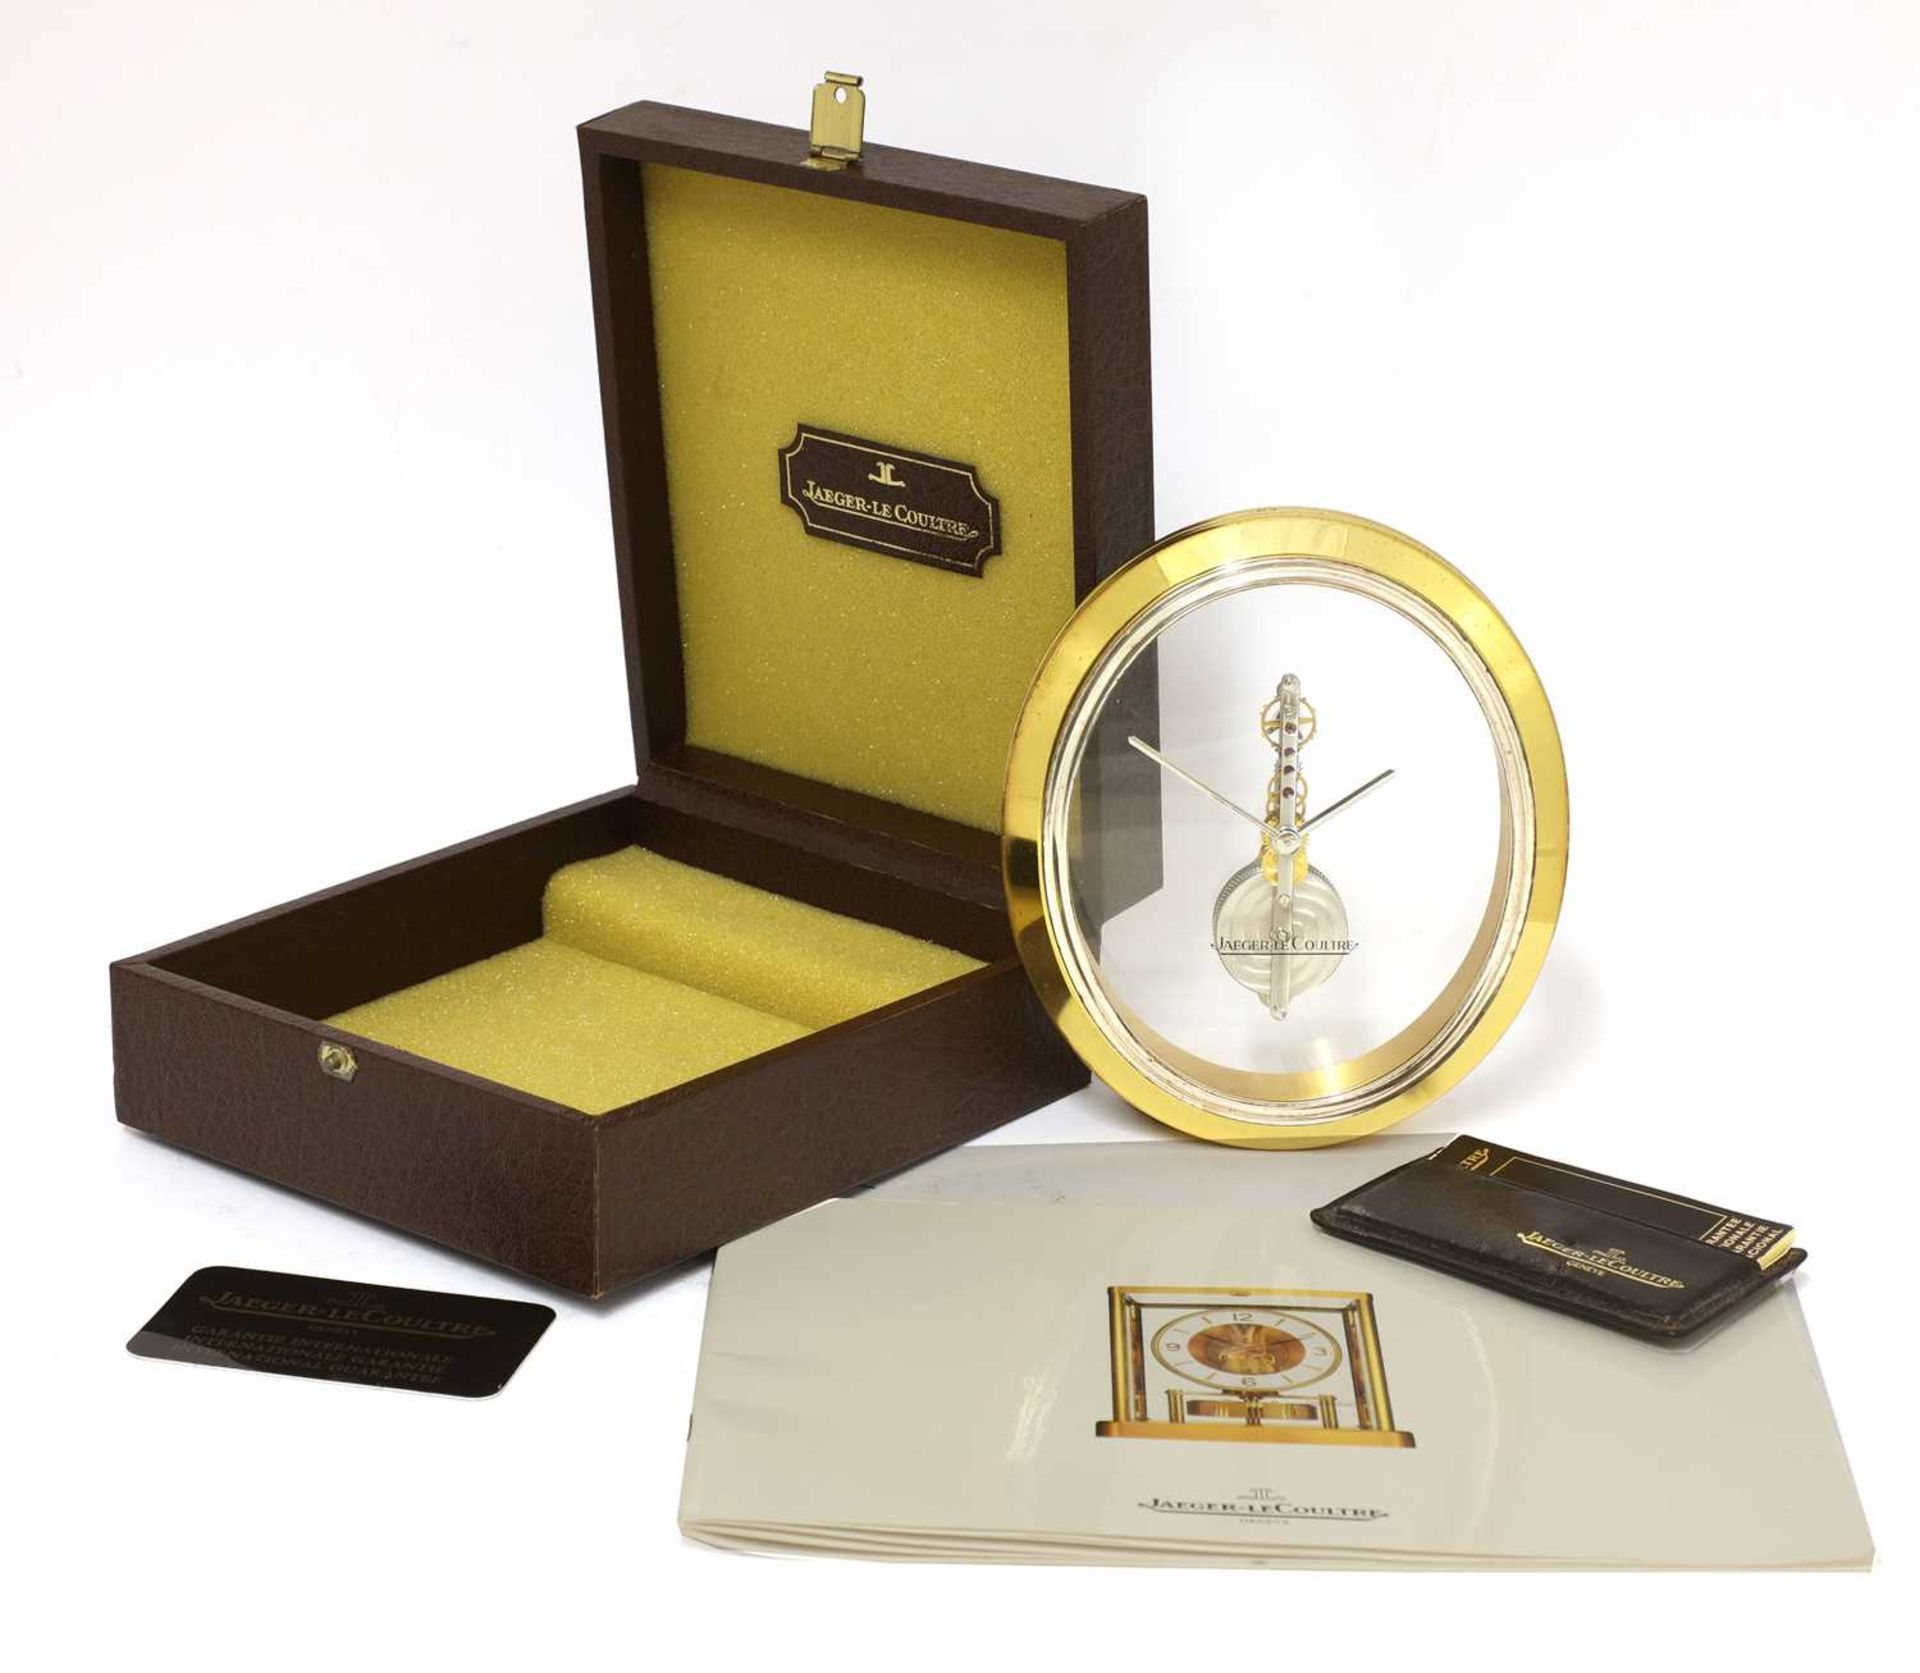 A Jaeger-LeCoultre 'Ovale' desk clock, - Image 4 of 4